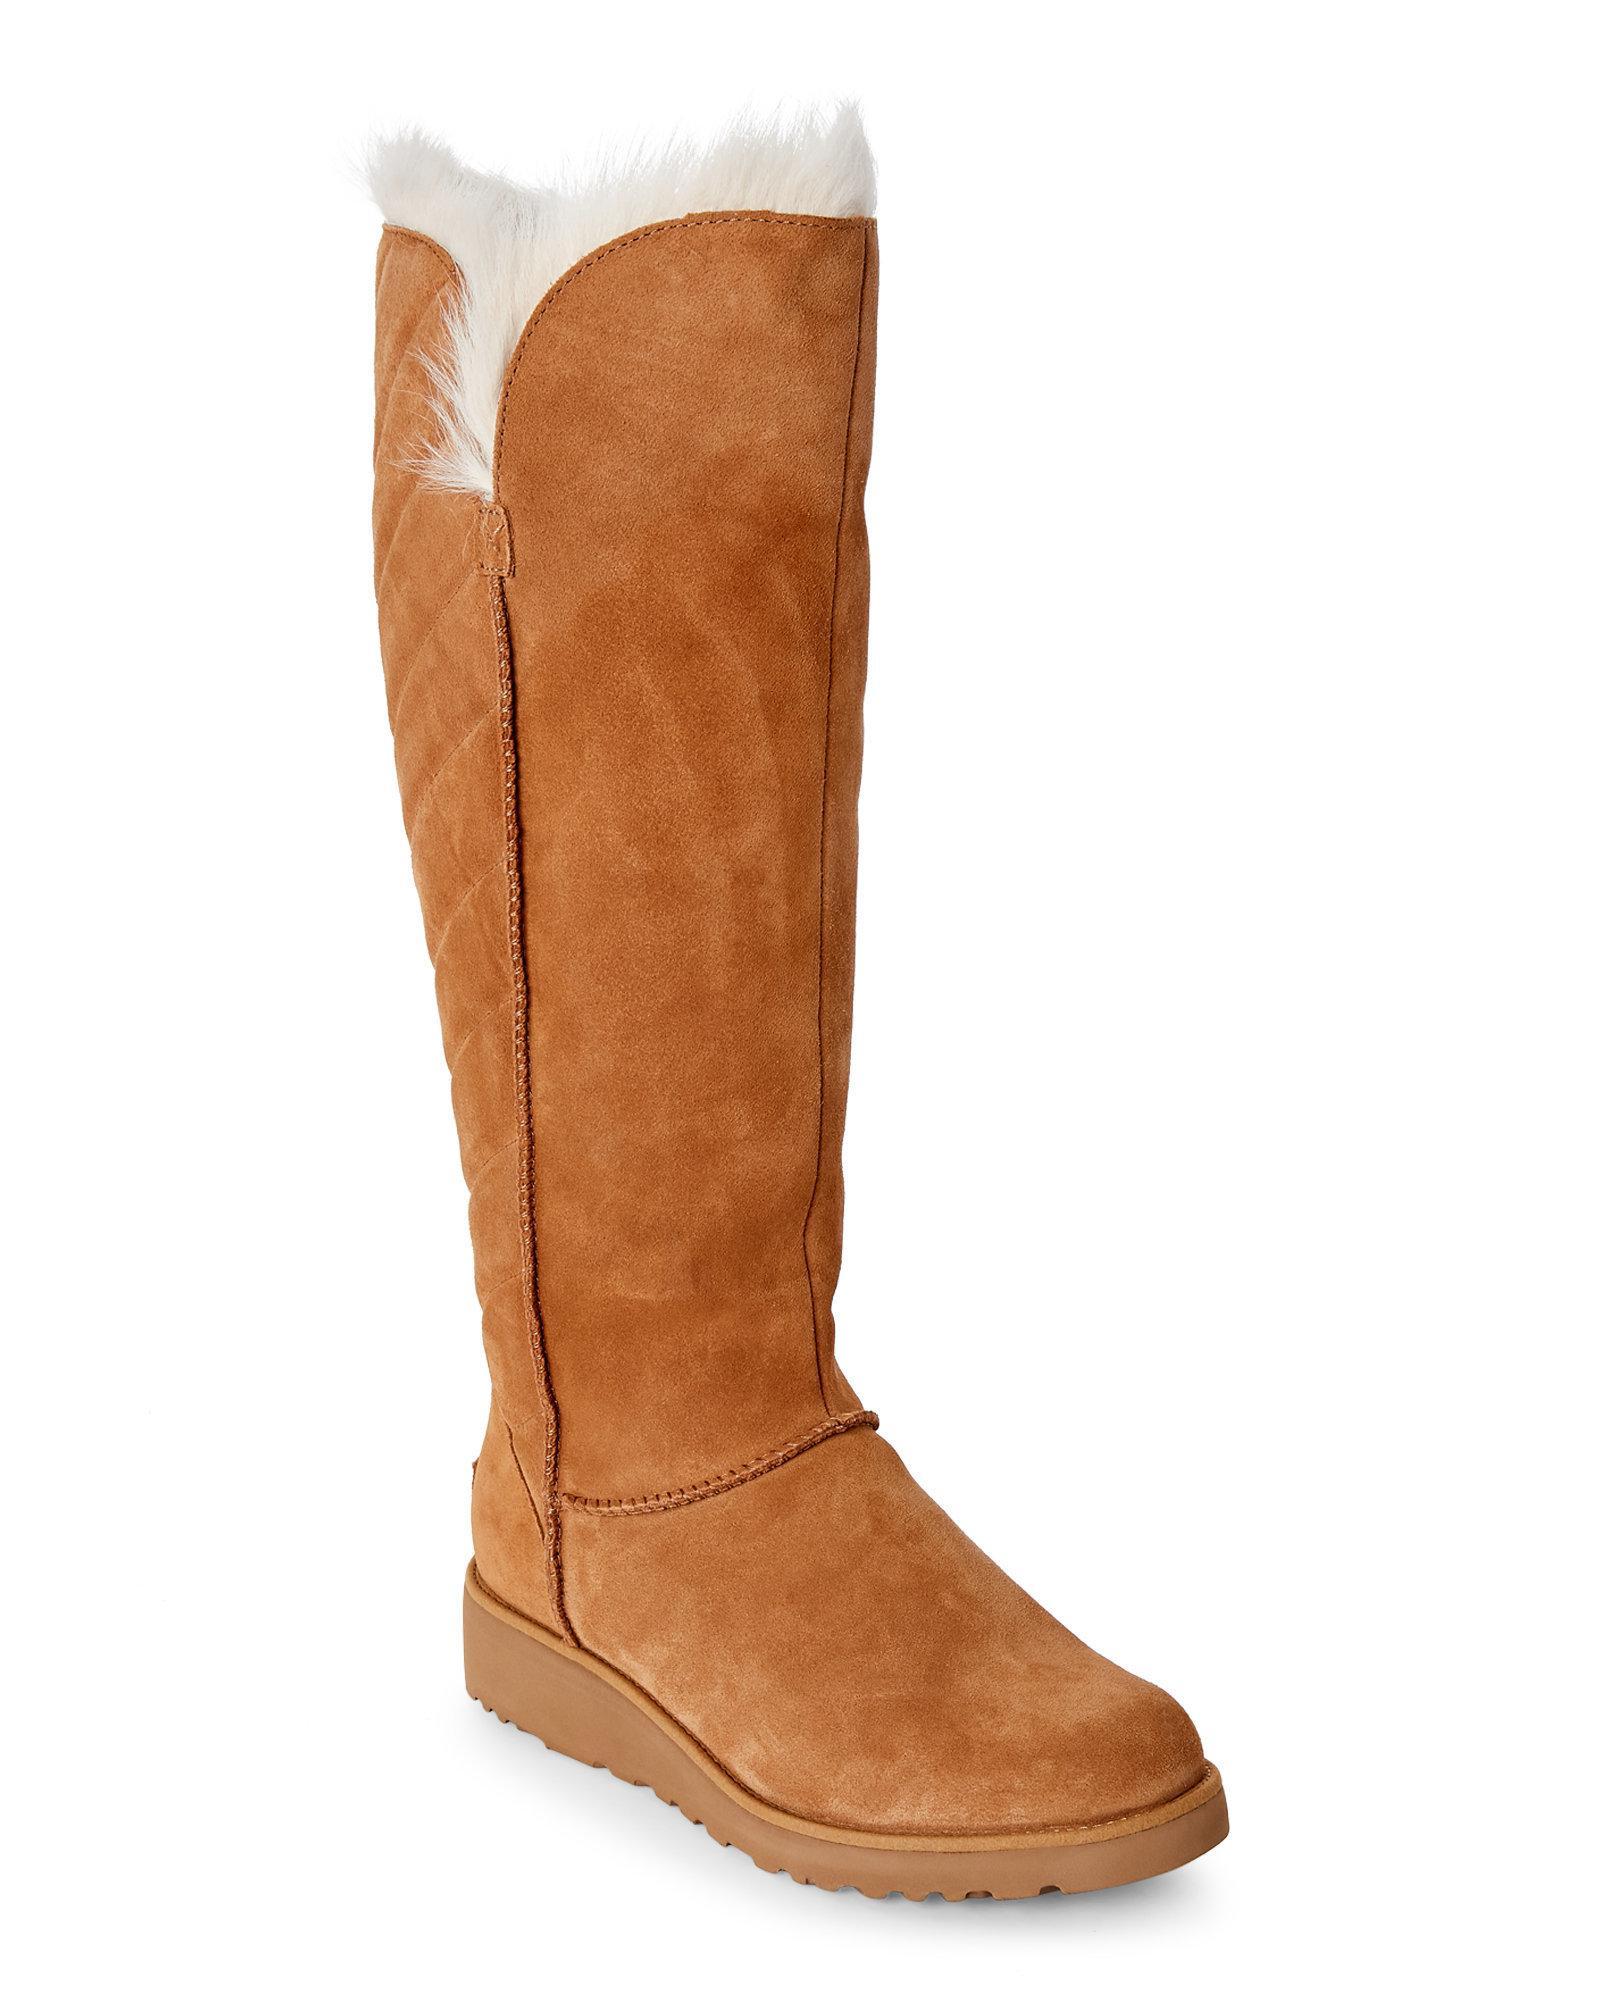 ebd90d240 UGG Chestnut Rosalind Tall Sheepskin Boots in Brown - Lyst